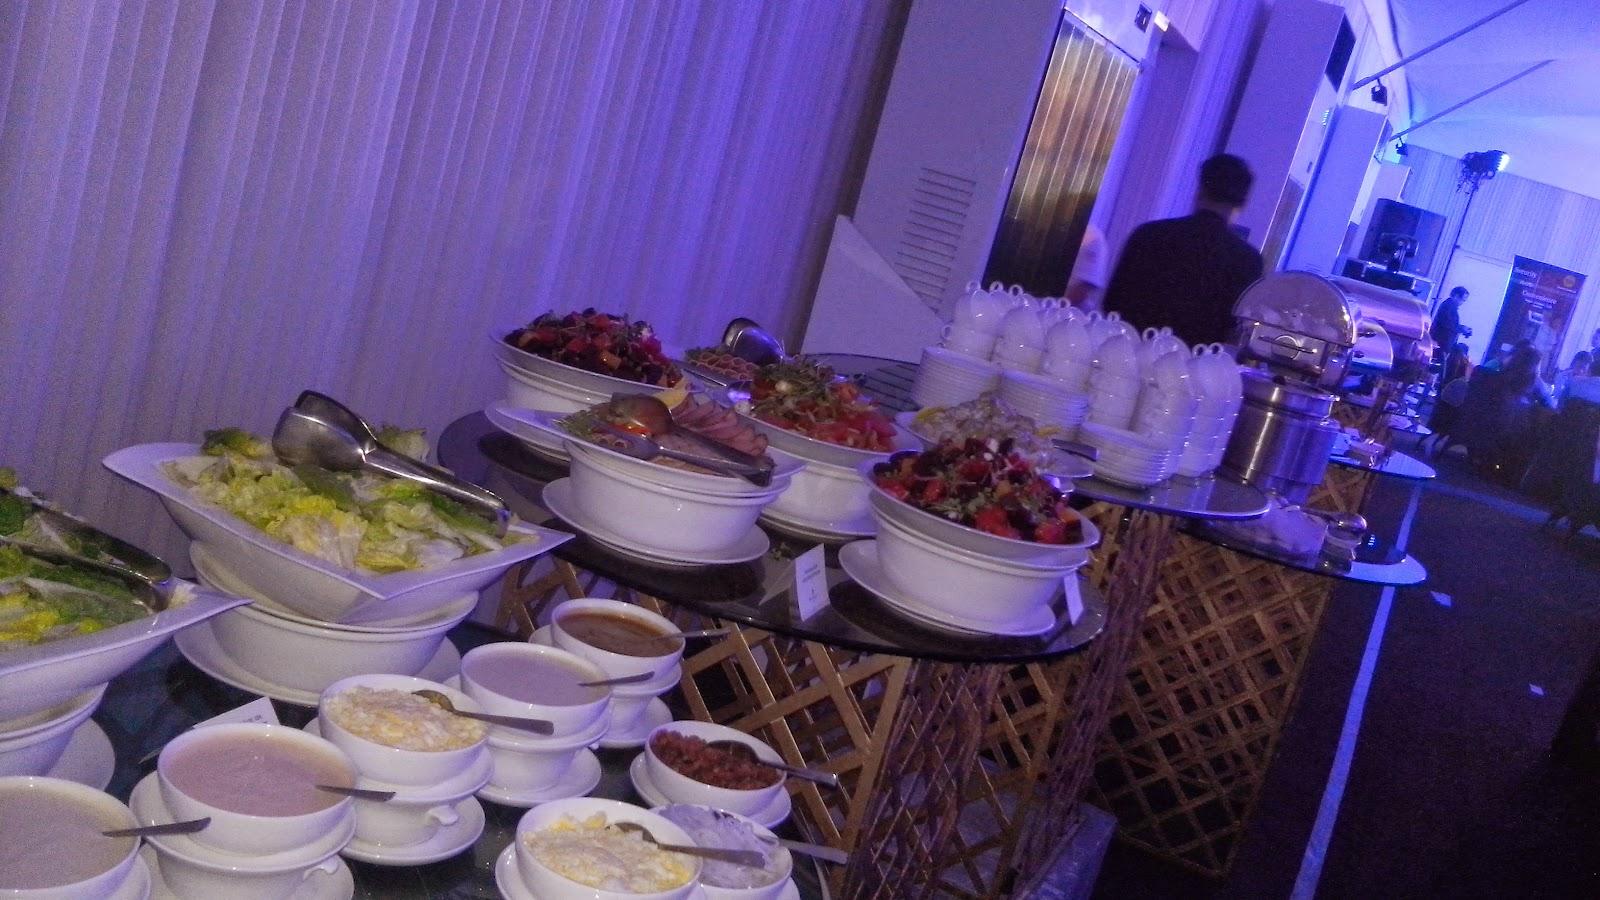 makati shangri-la hotel food